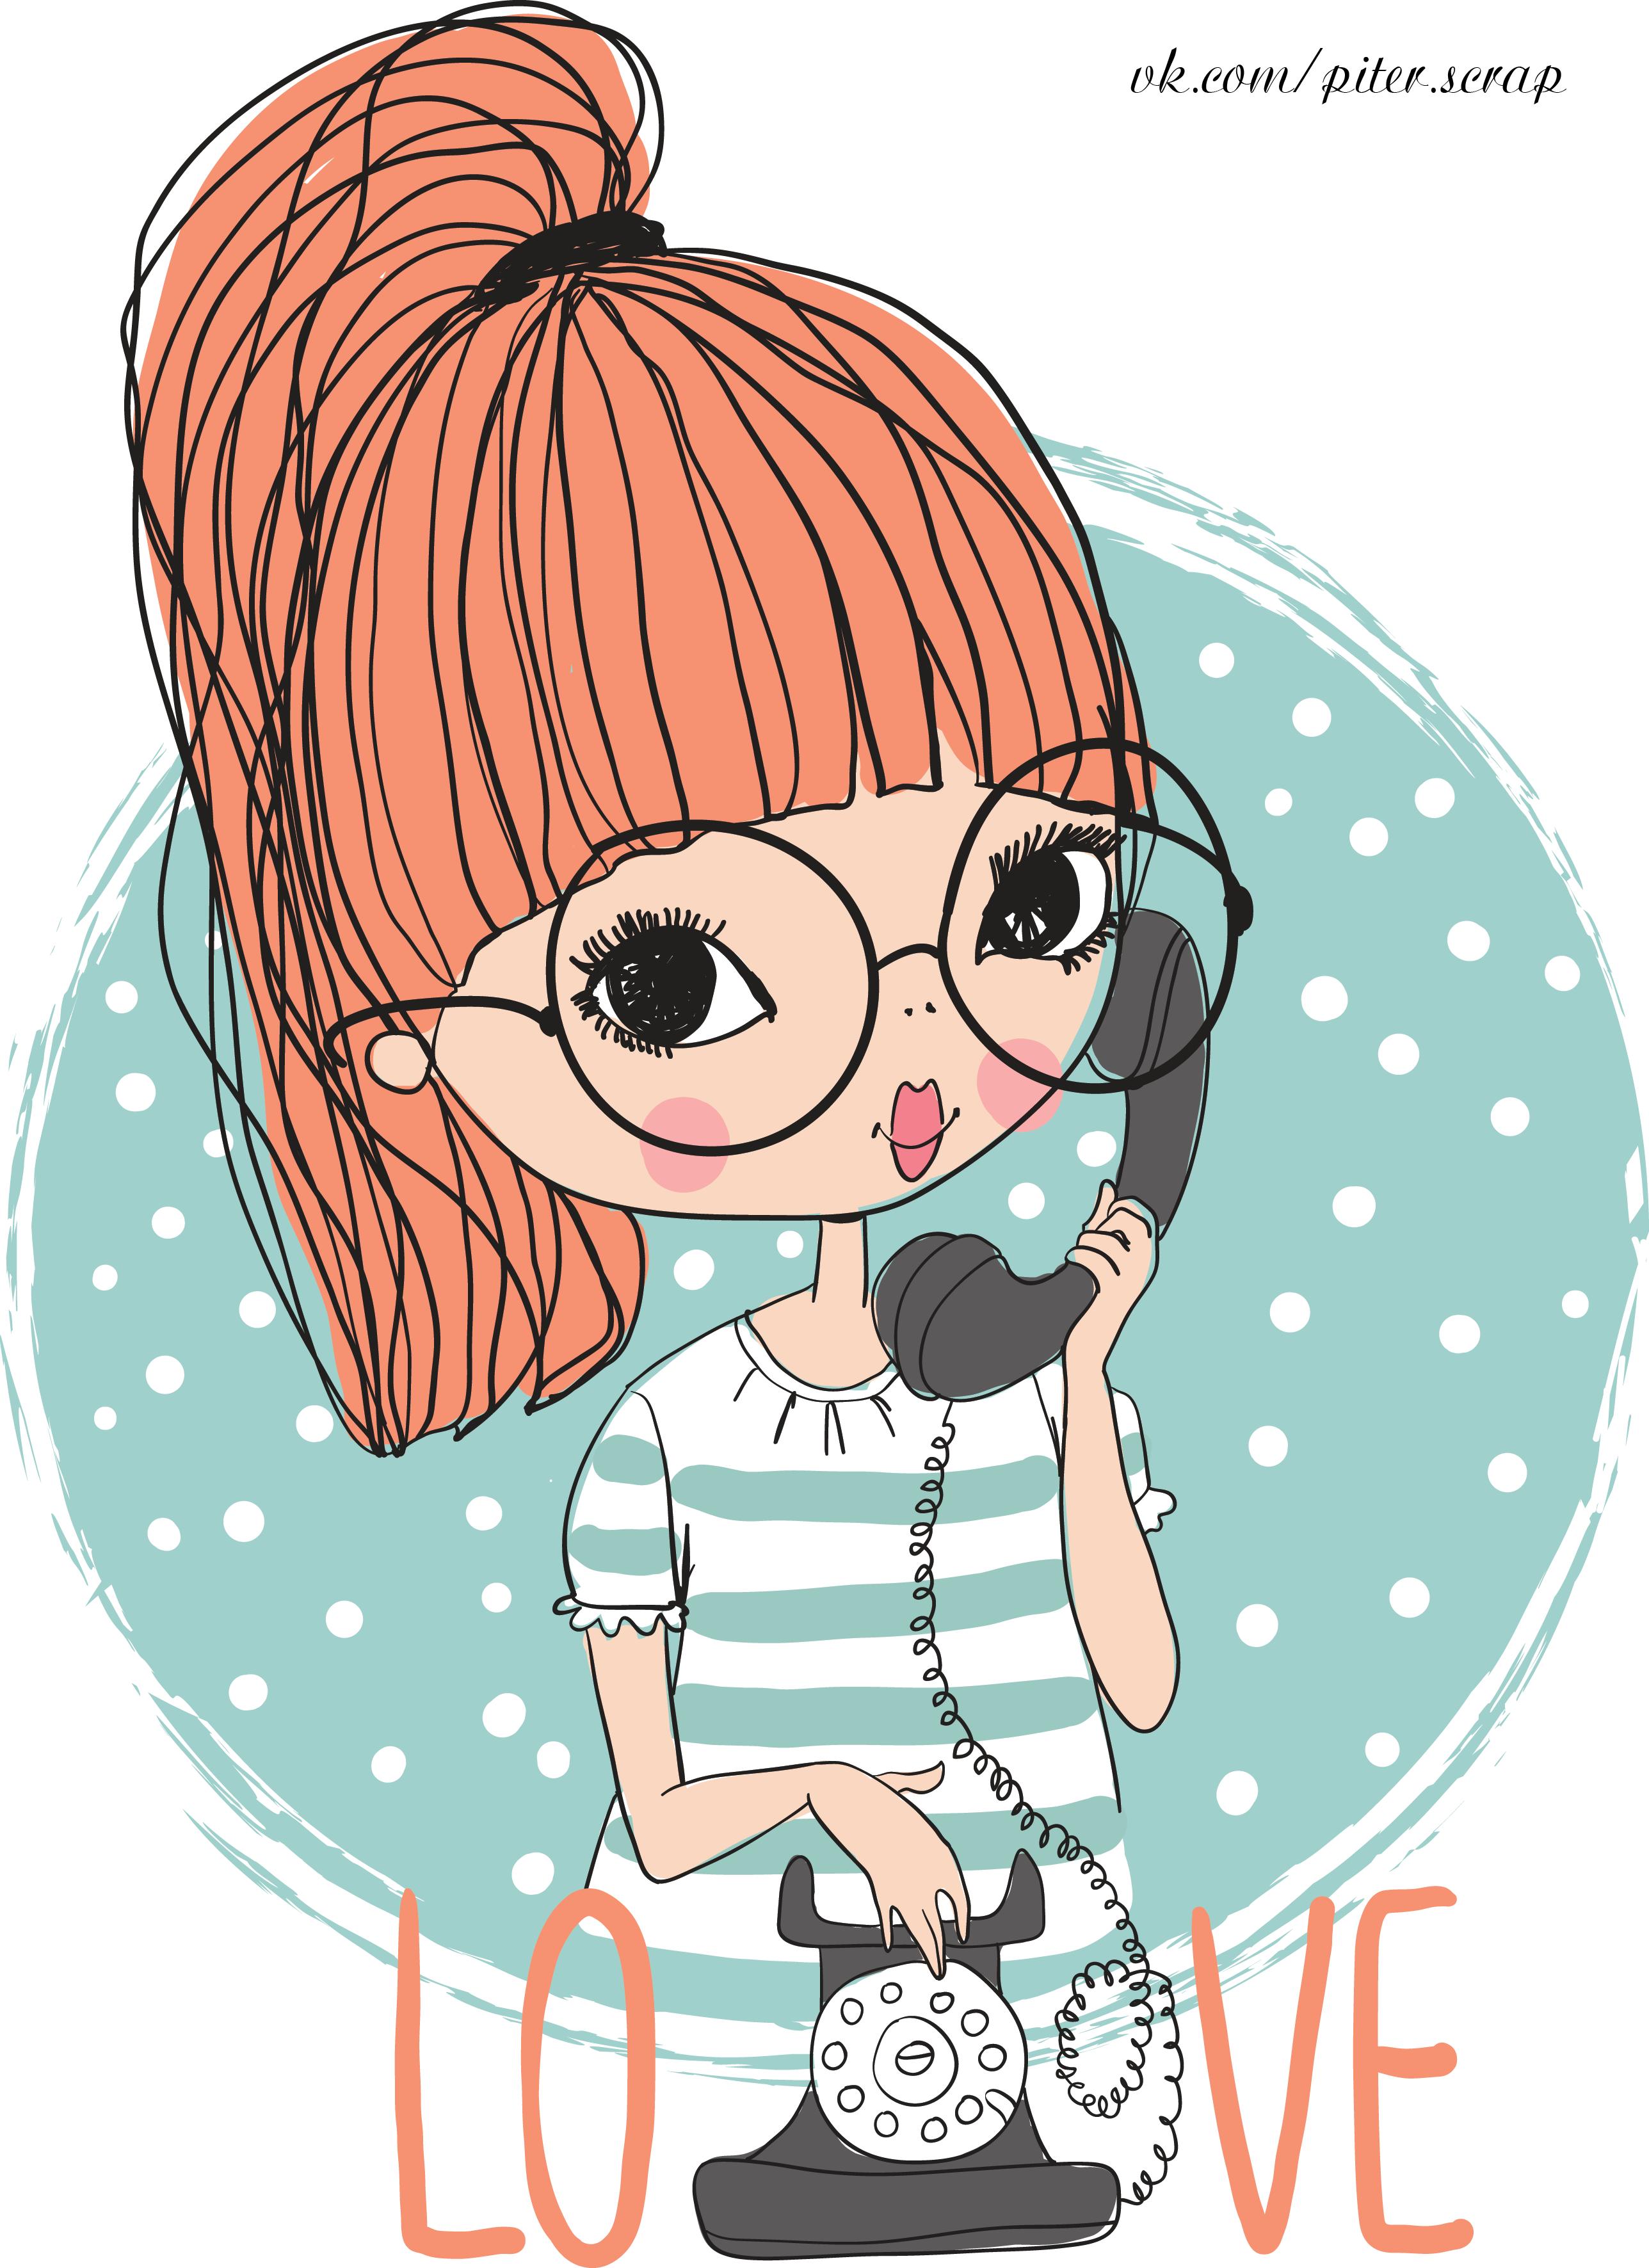 Comic book style lady clipart vector library download Natalia Skripko | Cute Kids Printables | Pinterest | Planners ... vector library download